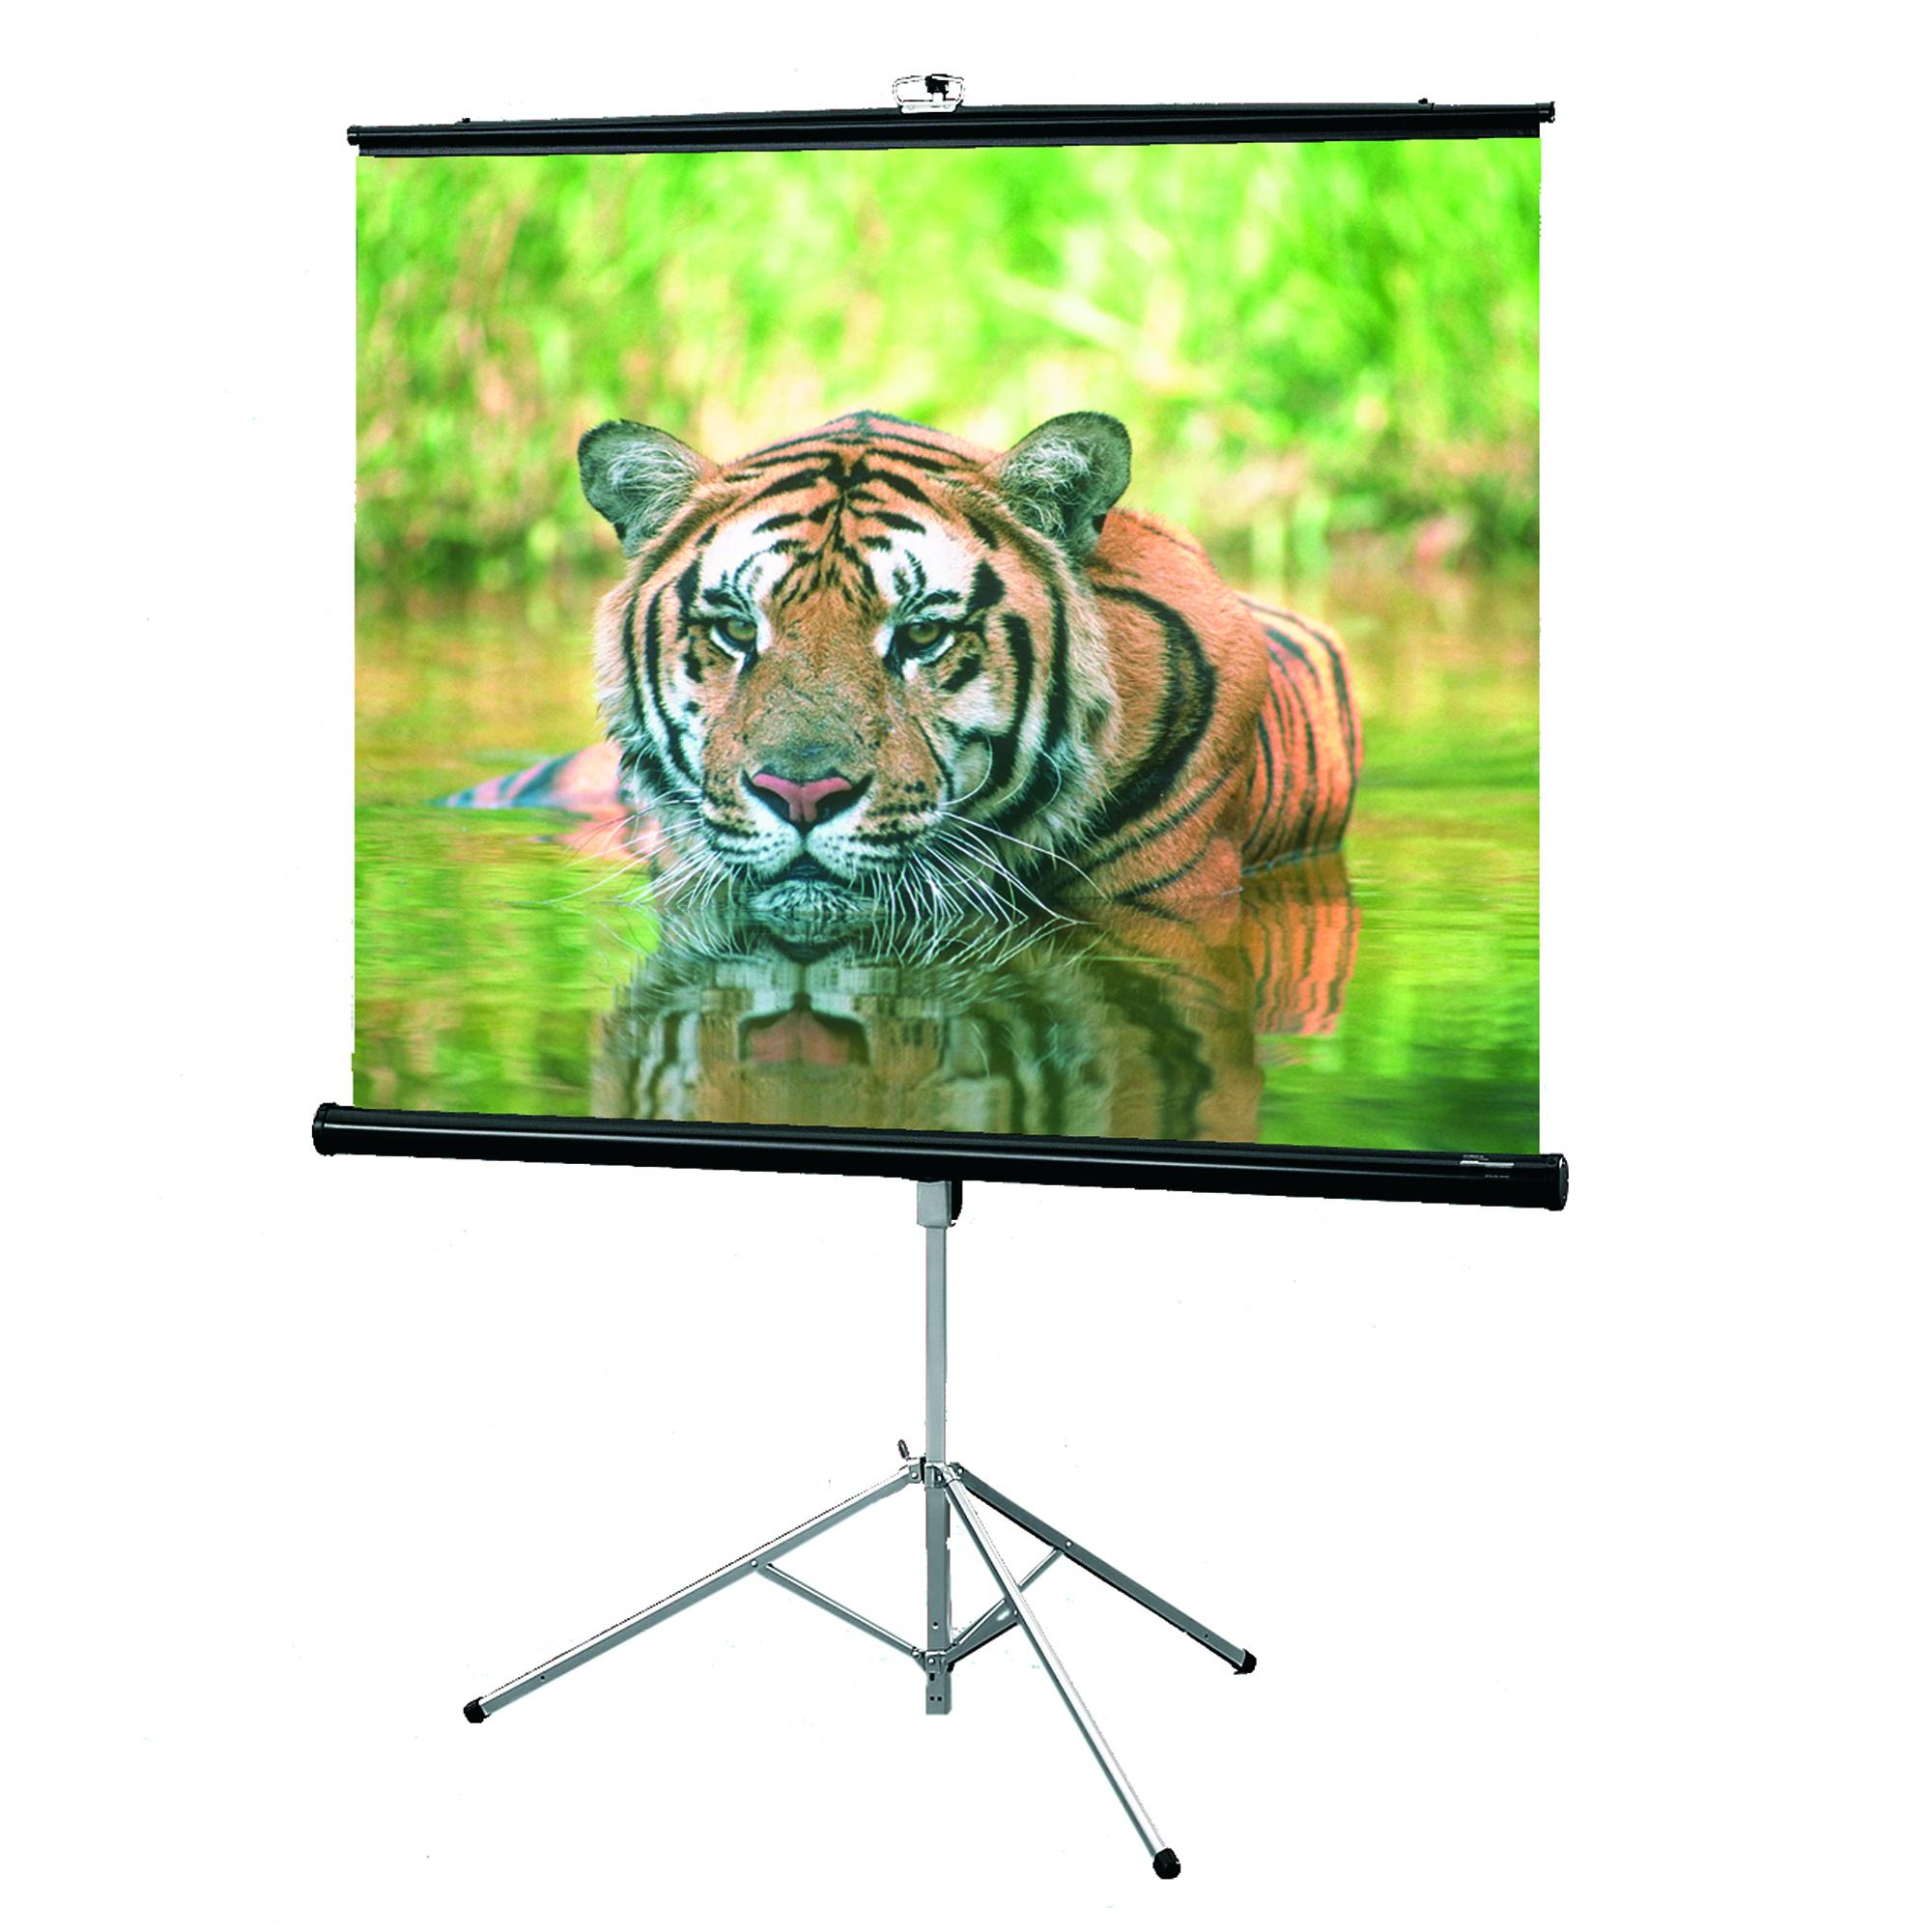 Экран для видеопроектора Draper Consul 216019 Consul 72' MW